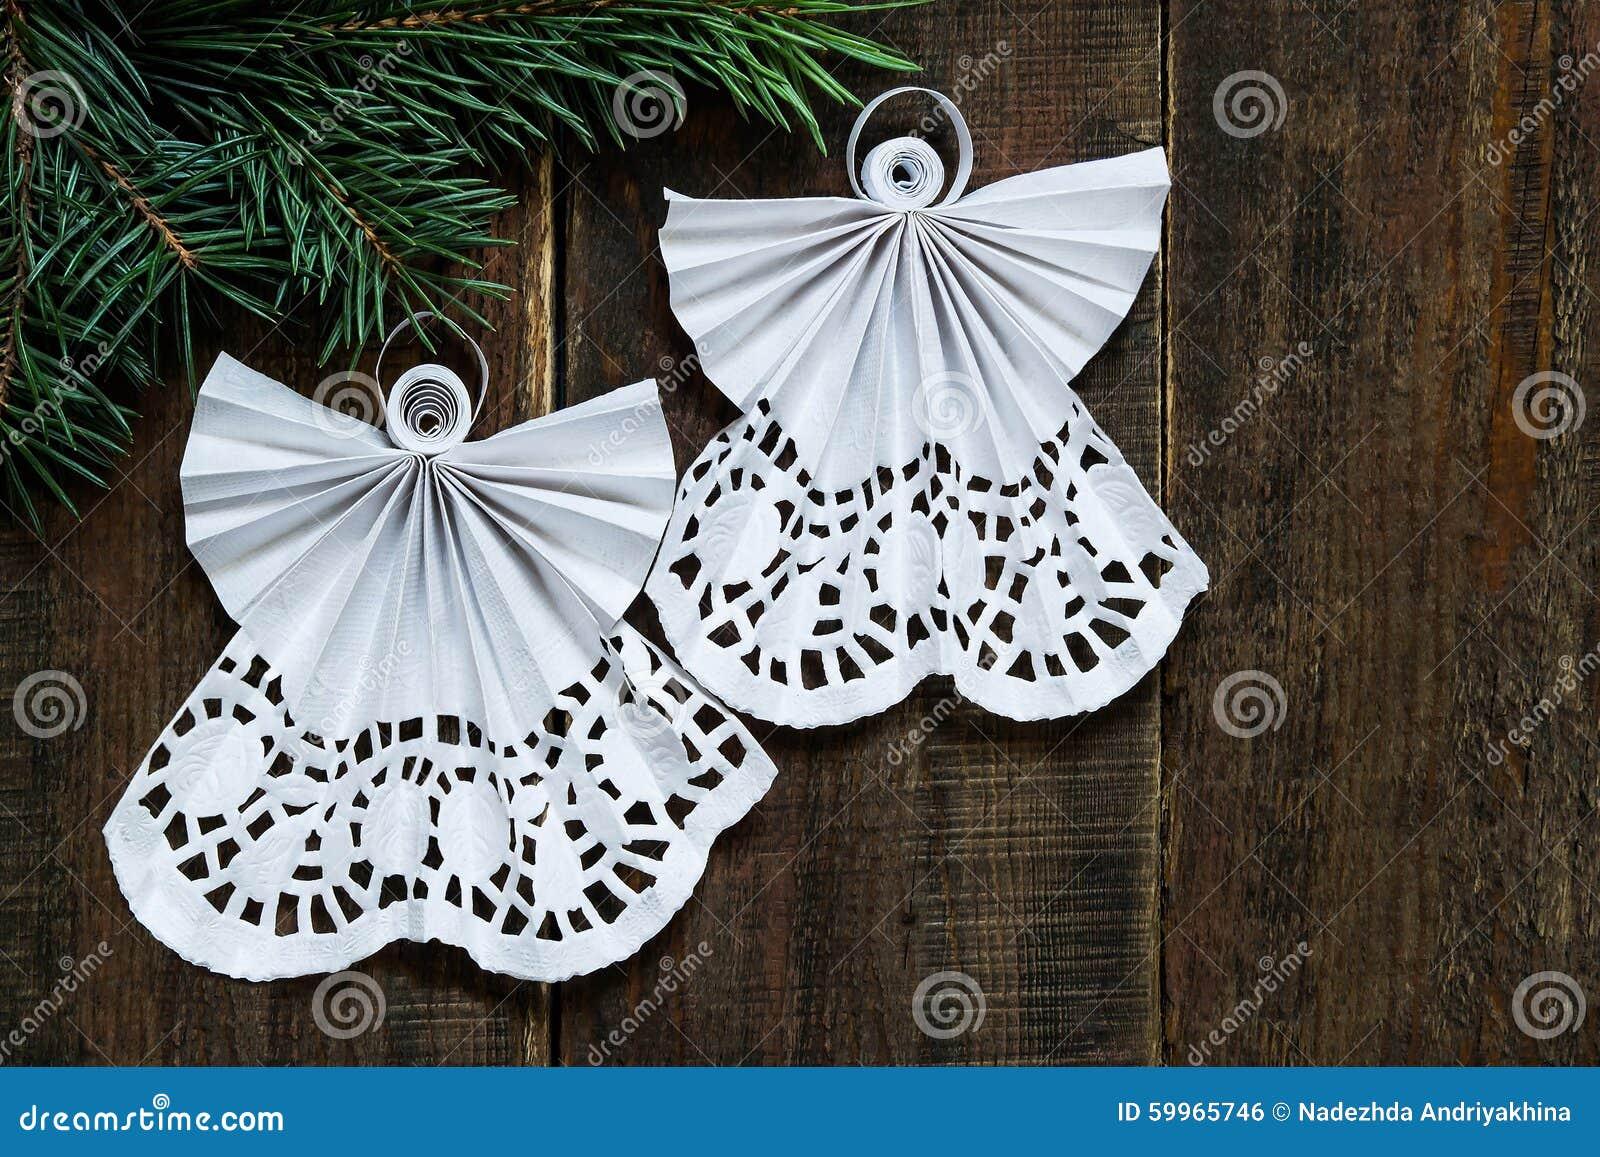 Decorazioni Natalizie Quilling.Angeli Openwork Nell Arte Della Decorazione Quilling Di Natale